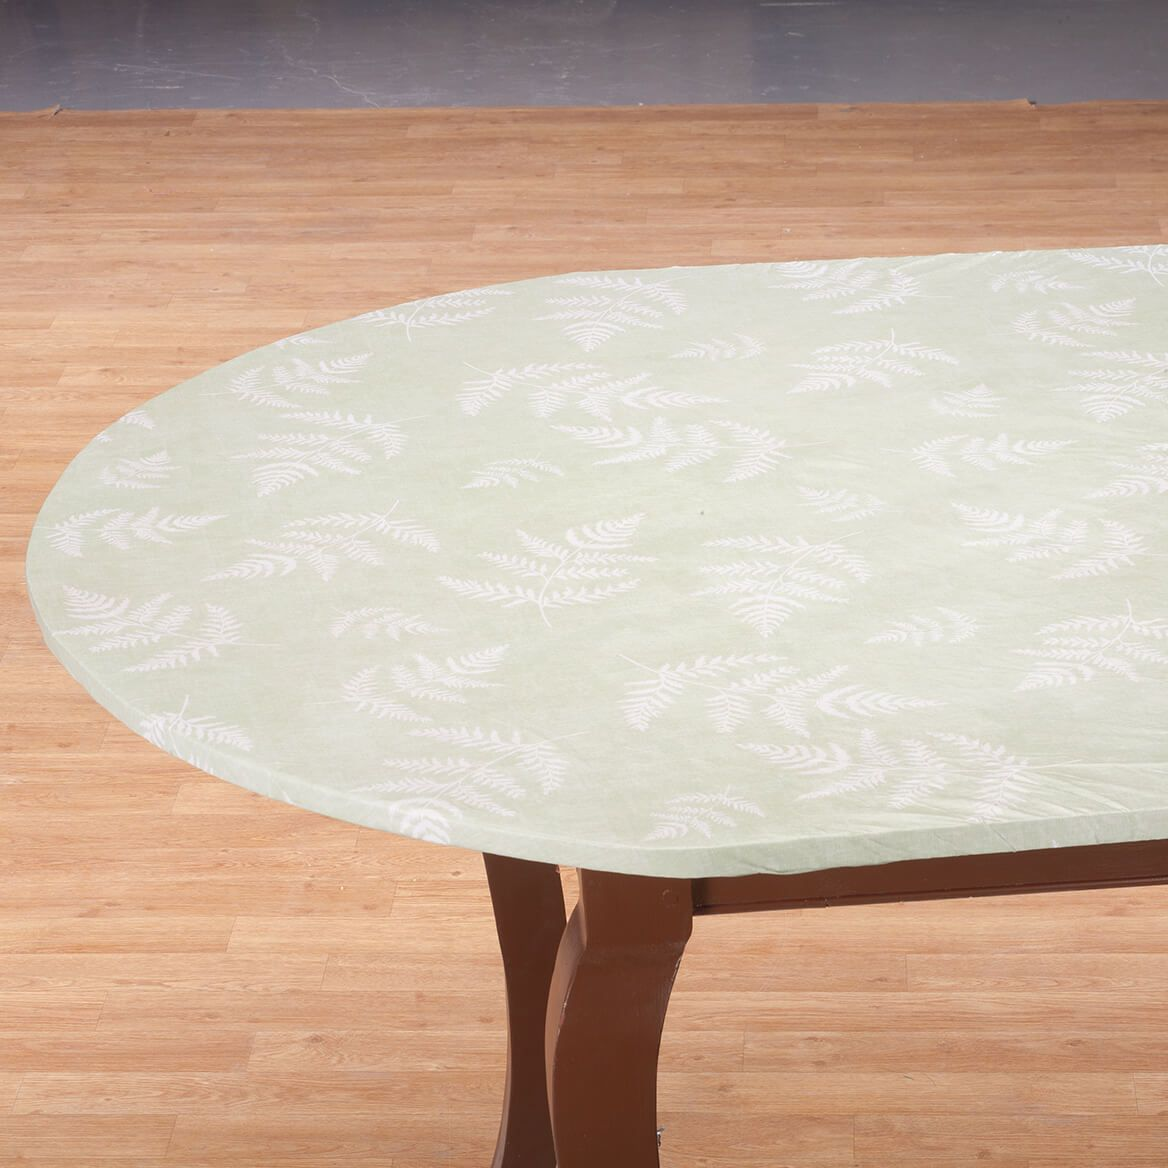 Fern Vinyl Elasticized Tablecover by Homestyle Kitchen-366983